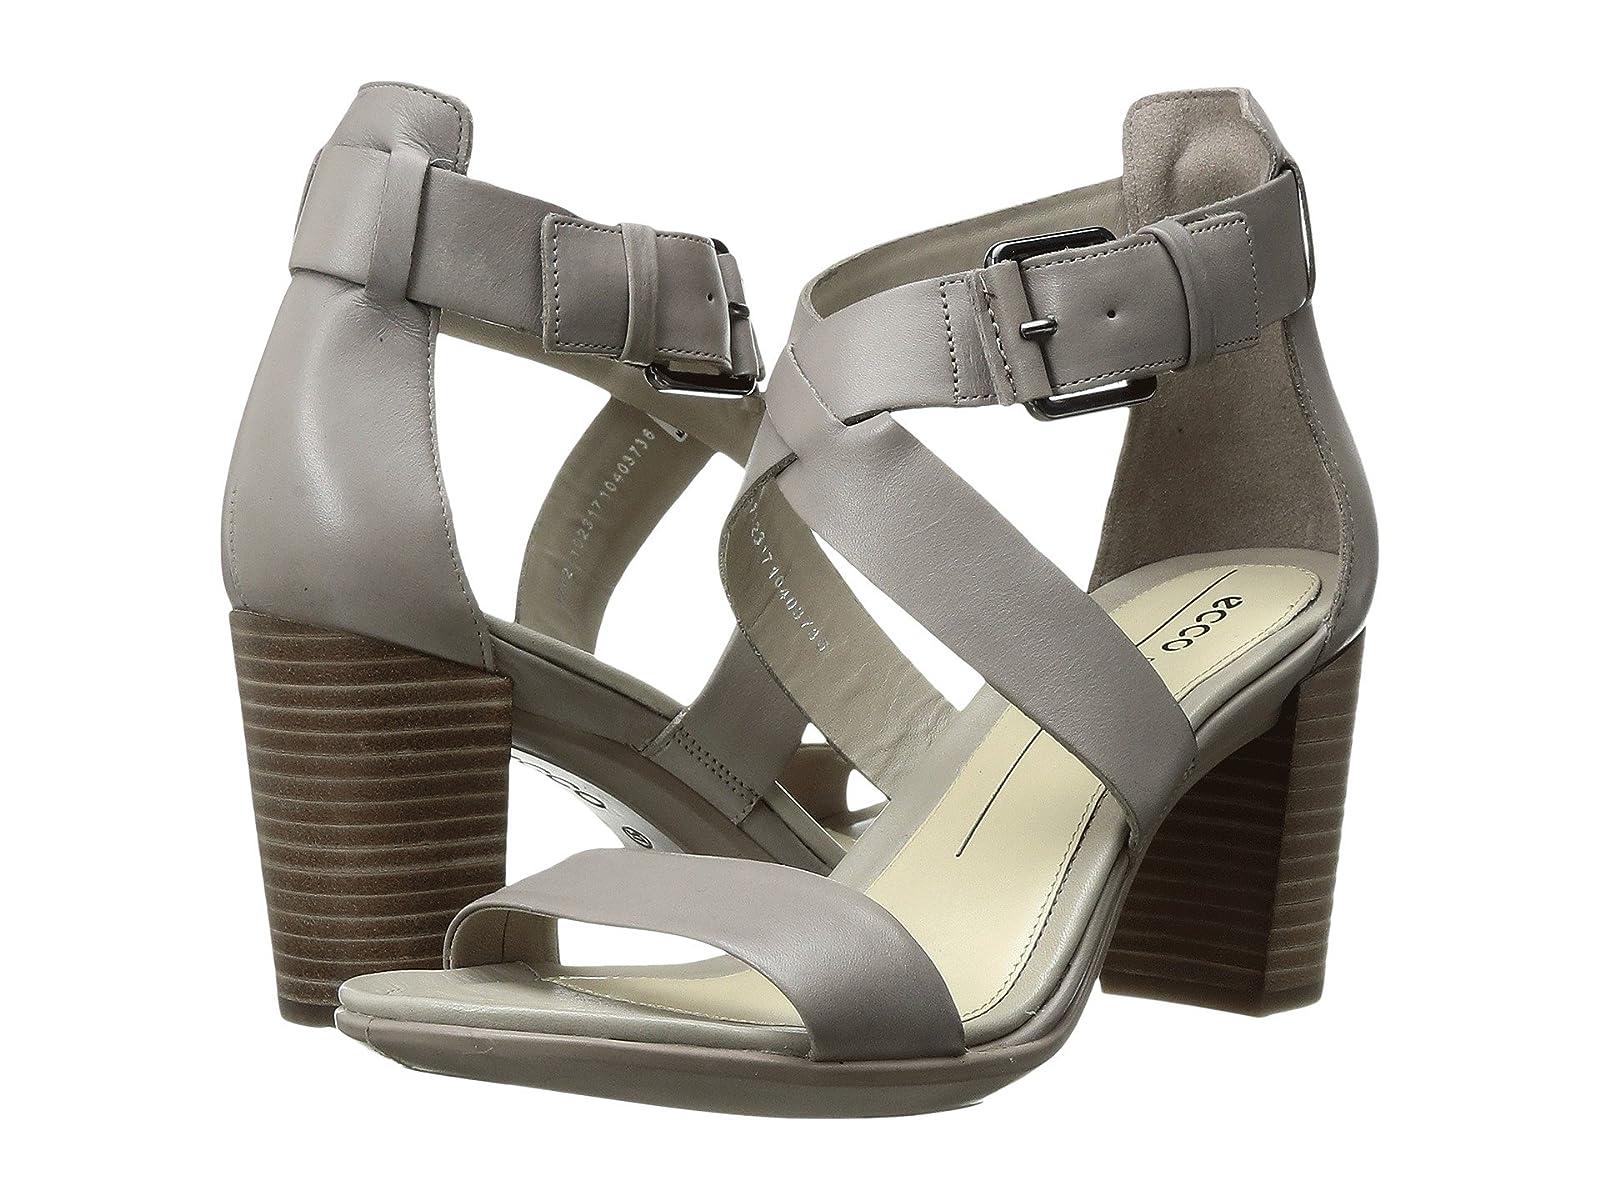 ECCO Shape 65 Block SandalCheap and distinctive eye-catching shoes